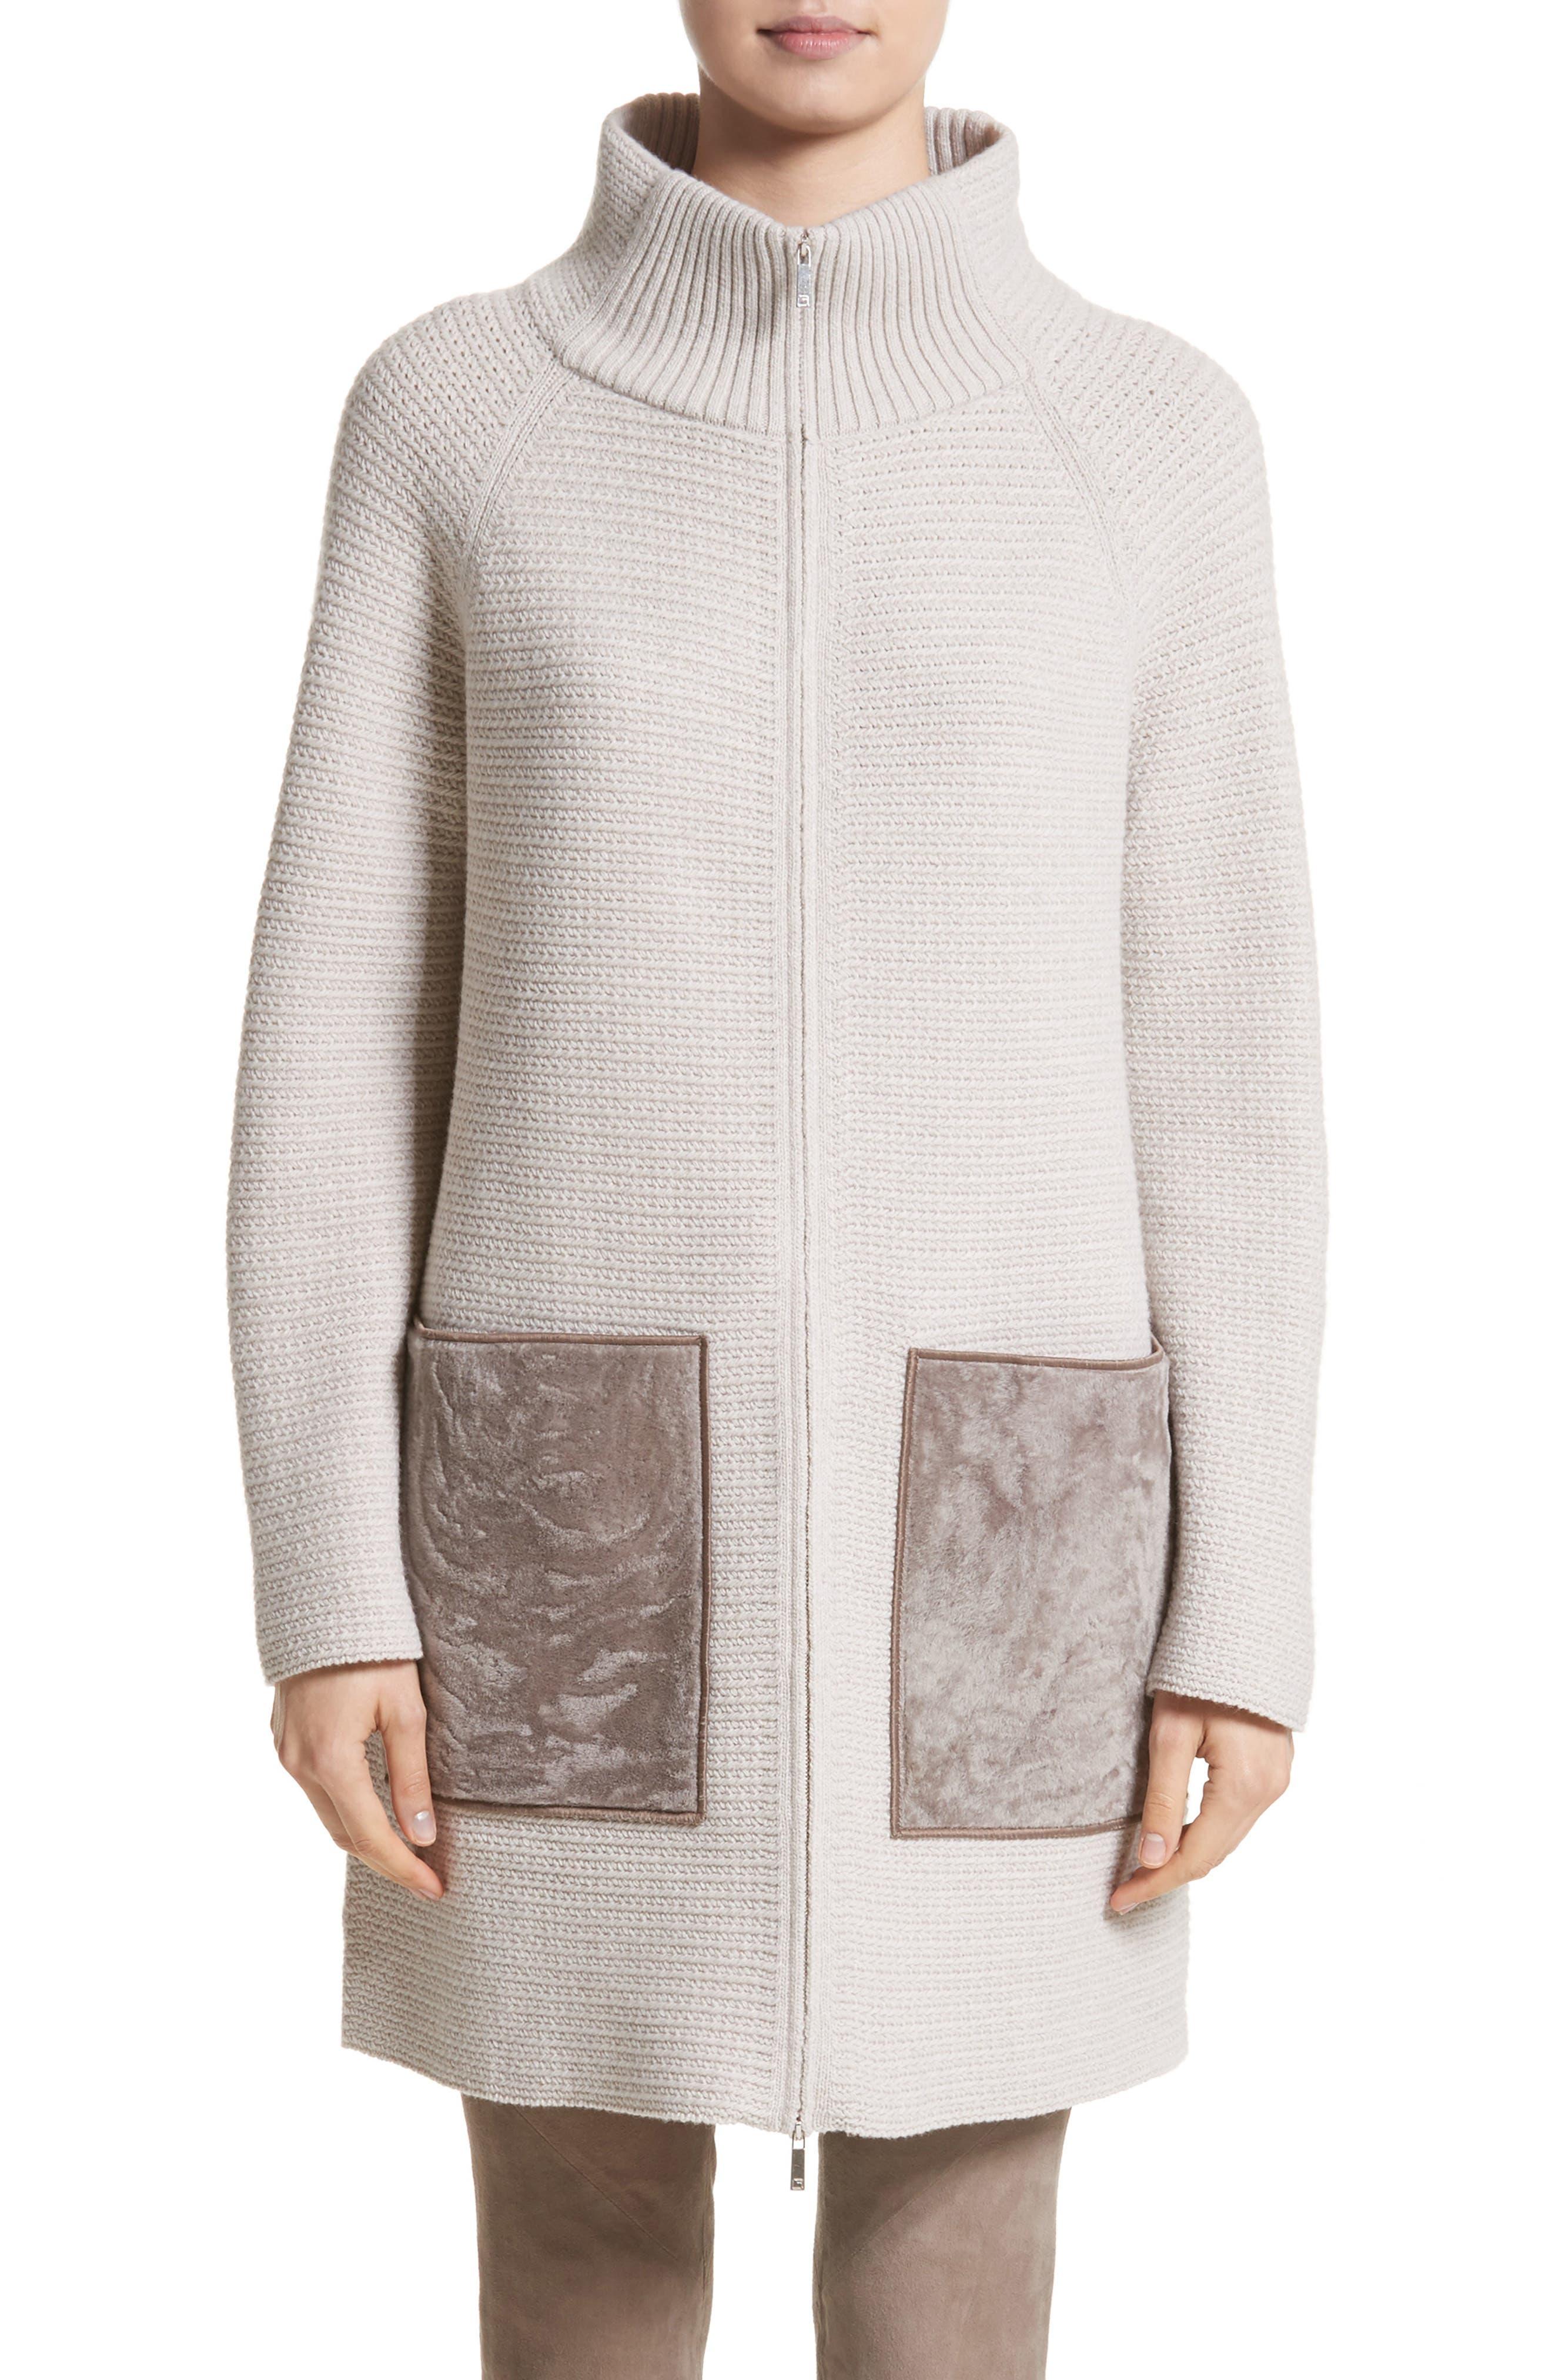 Main Image - Lafayette 148 New York Wool & Cashmere Herringbone Stitch Cardigan with Genuine Shearling Pockets